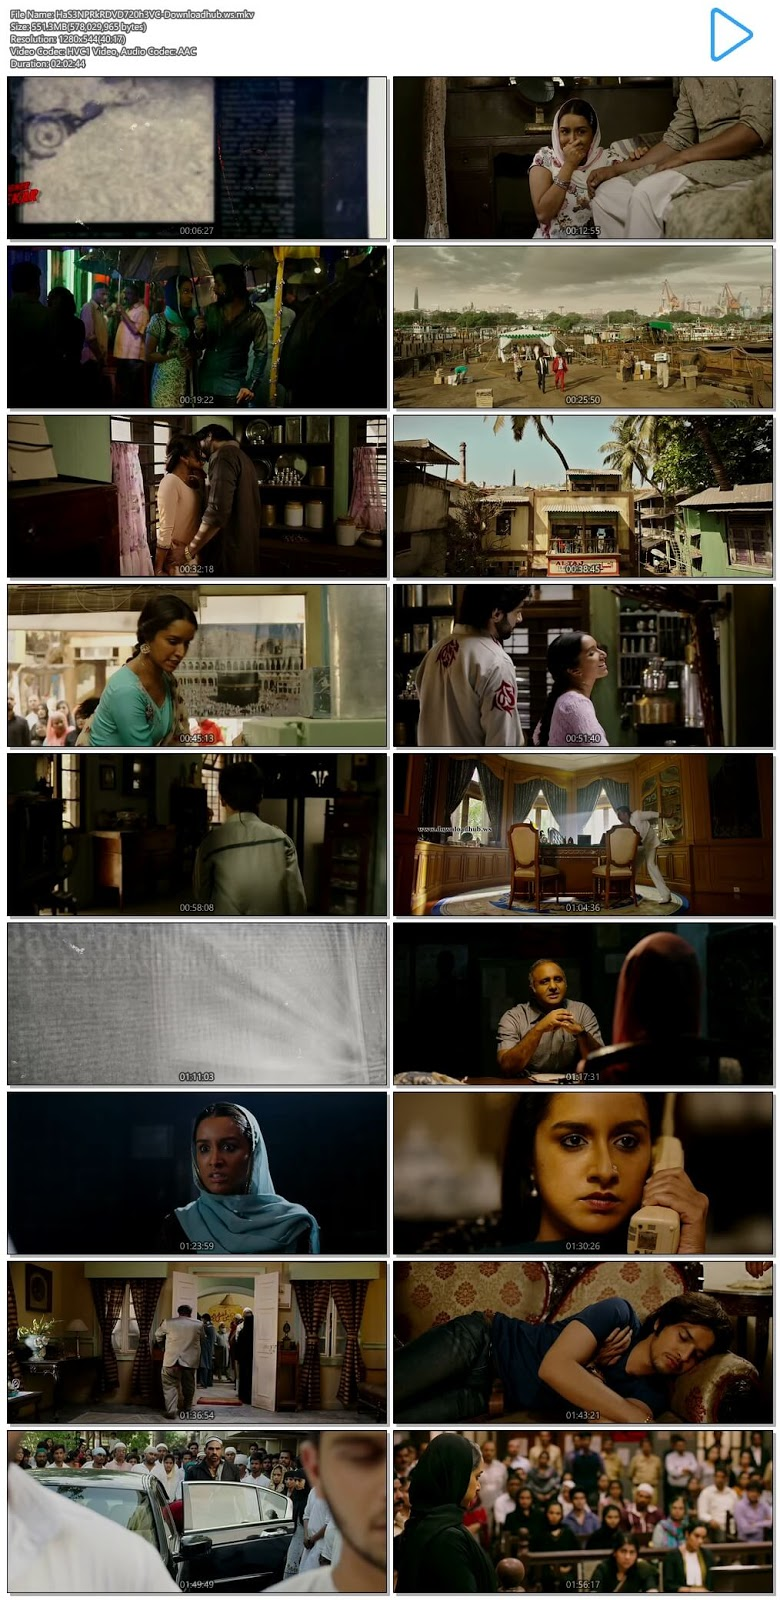 Haseena Parkar 2017 Hindi 720p HEVC DVDRip